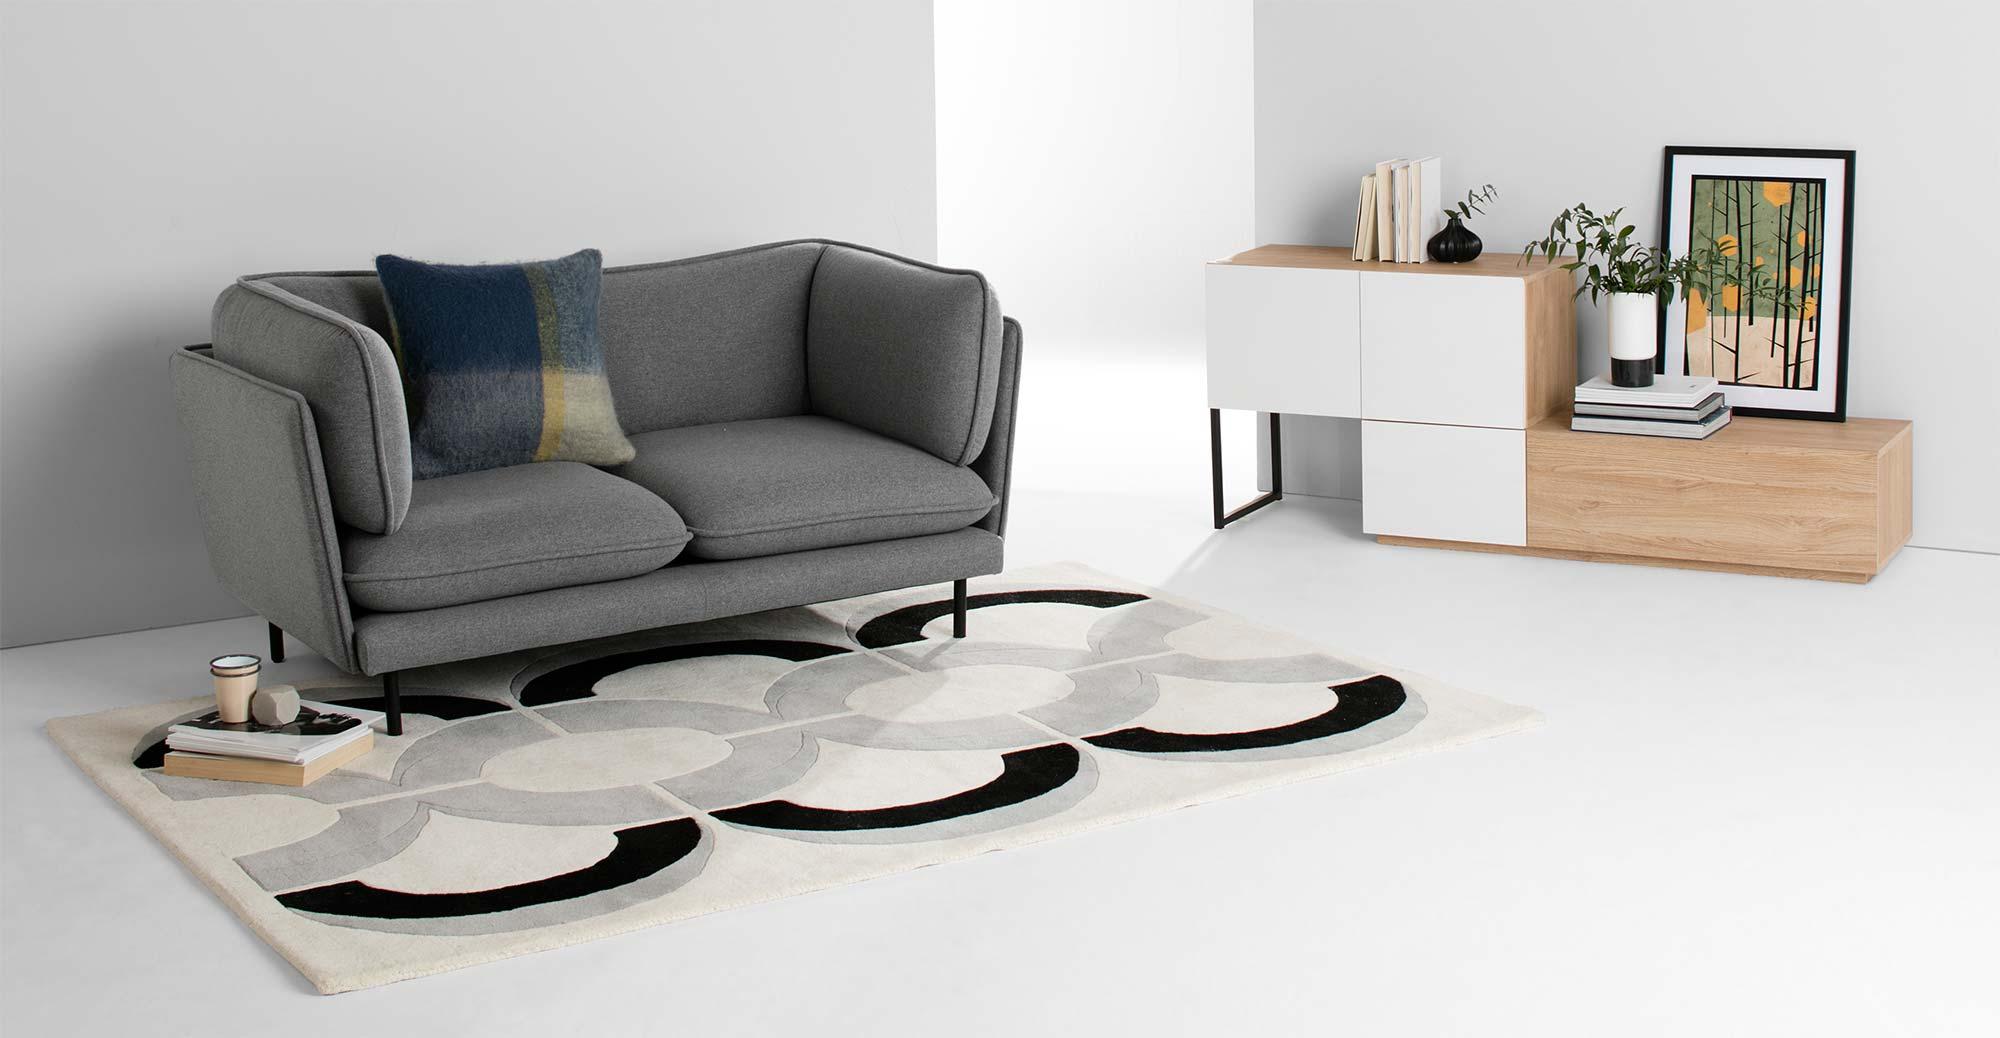 canape gris places made en soldes. Black Bedroom Furniture Sets. Home Design Ideas